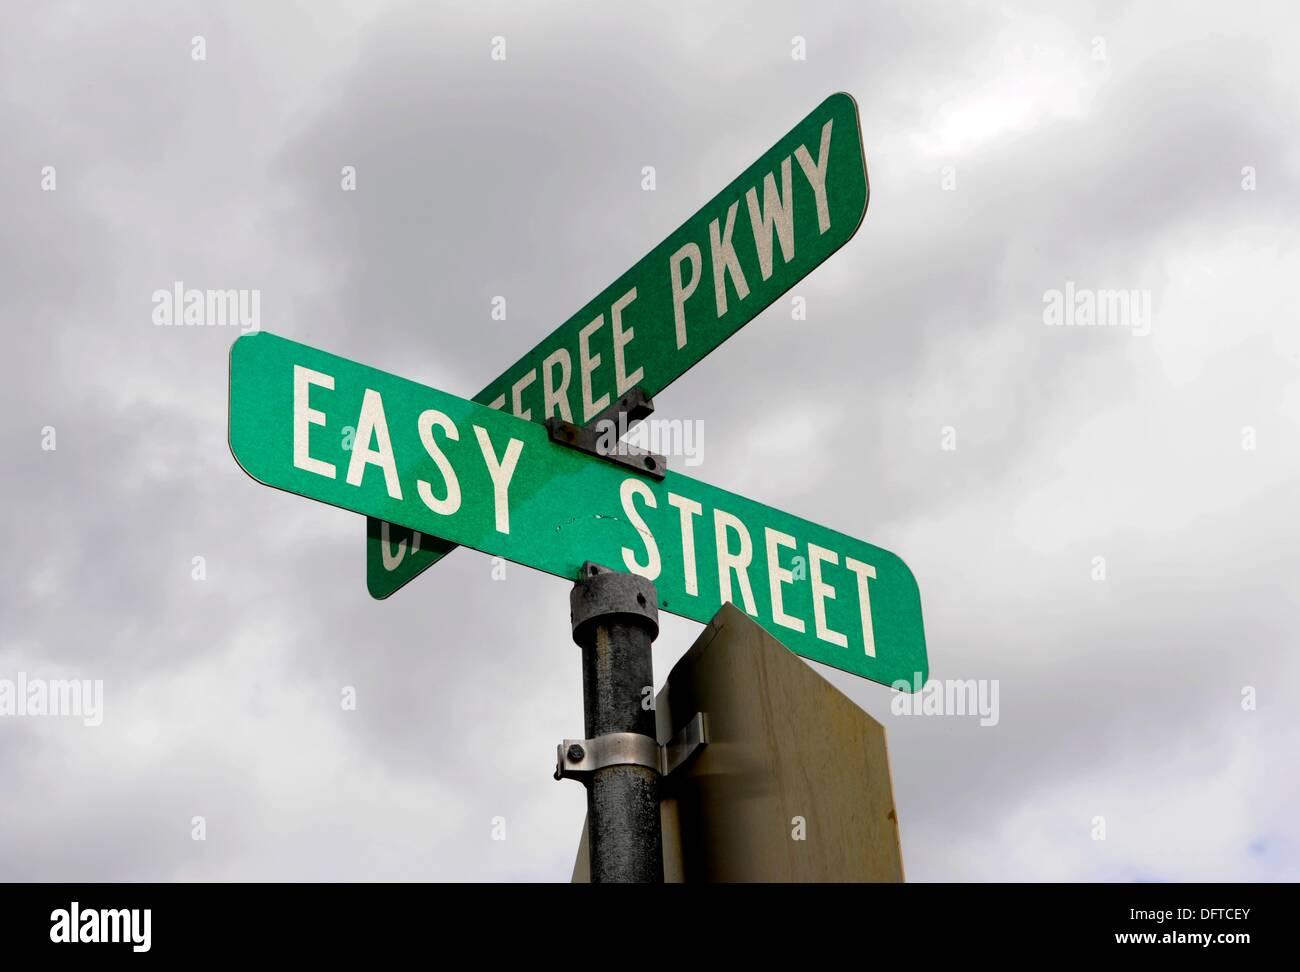 Easy Street sign destacando el concepto de fácil Imagen De Stock